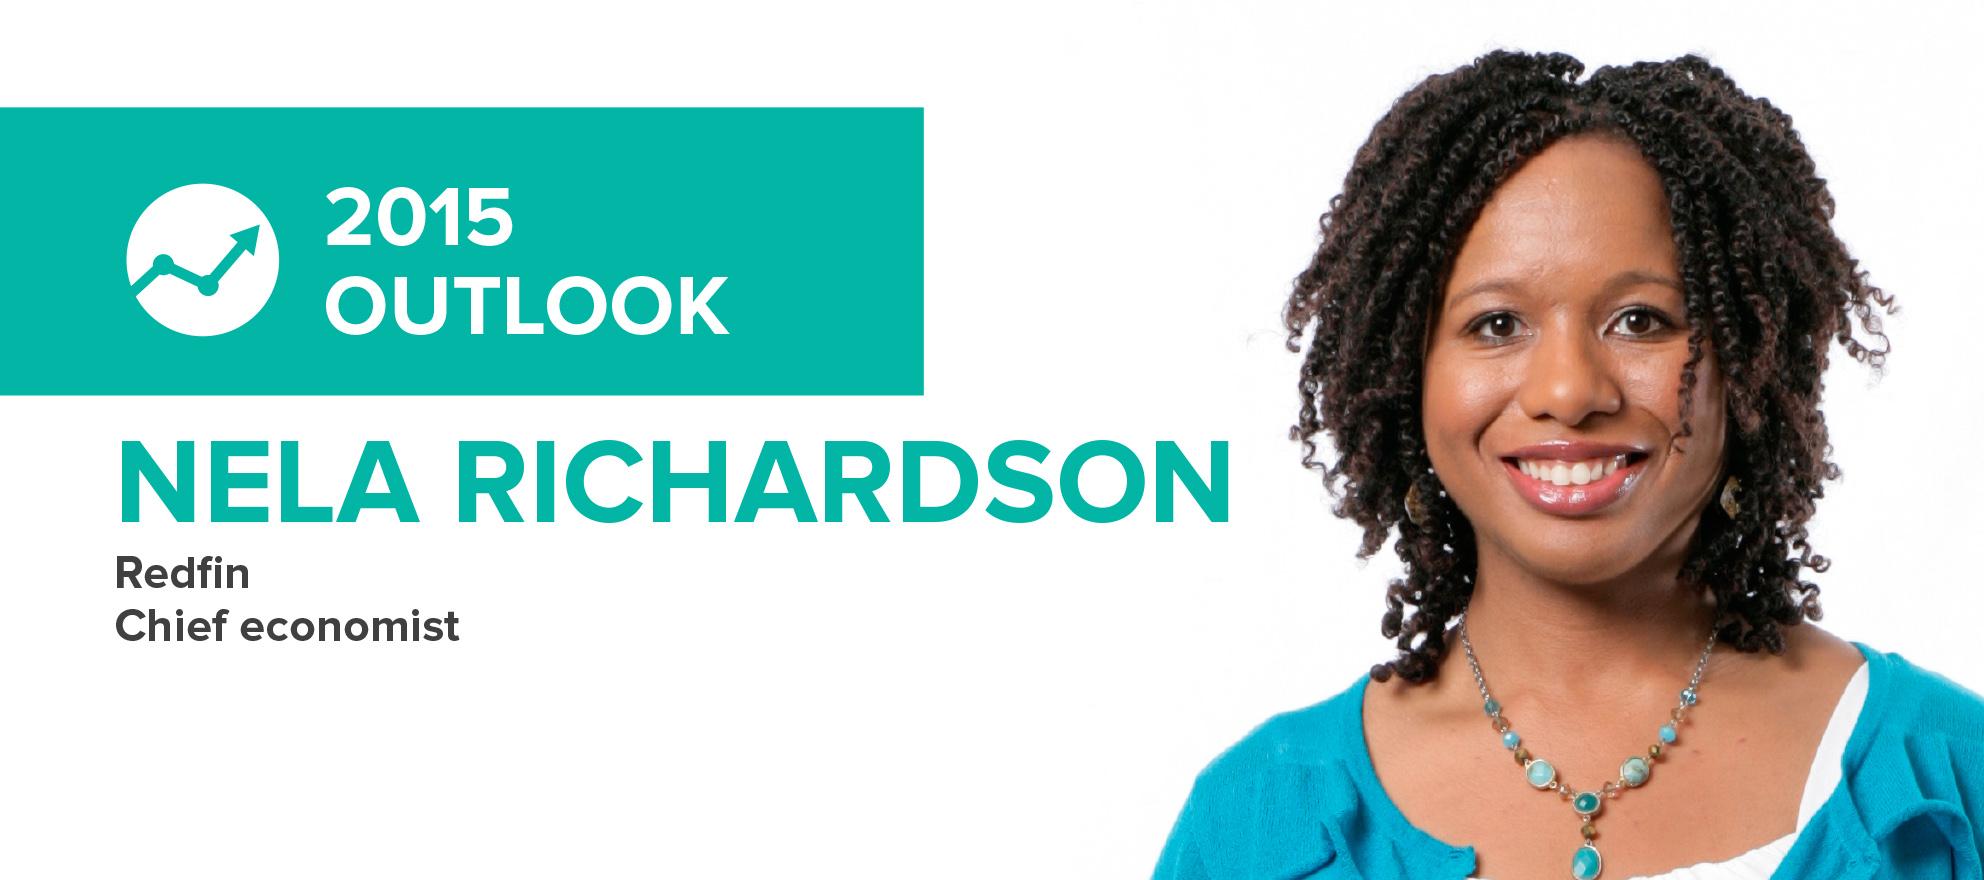 Nela Richardson: 'One of the bigger juggernauts of the market finally loosens up next year'